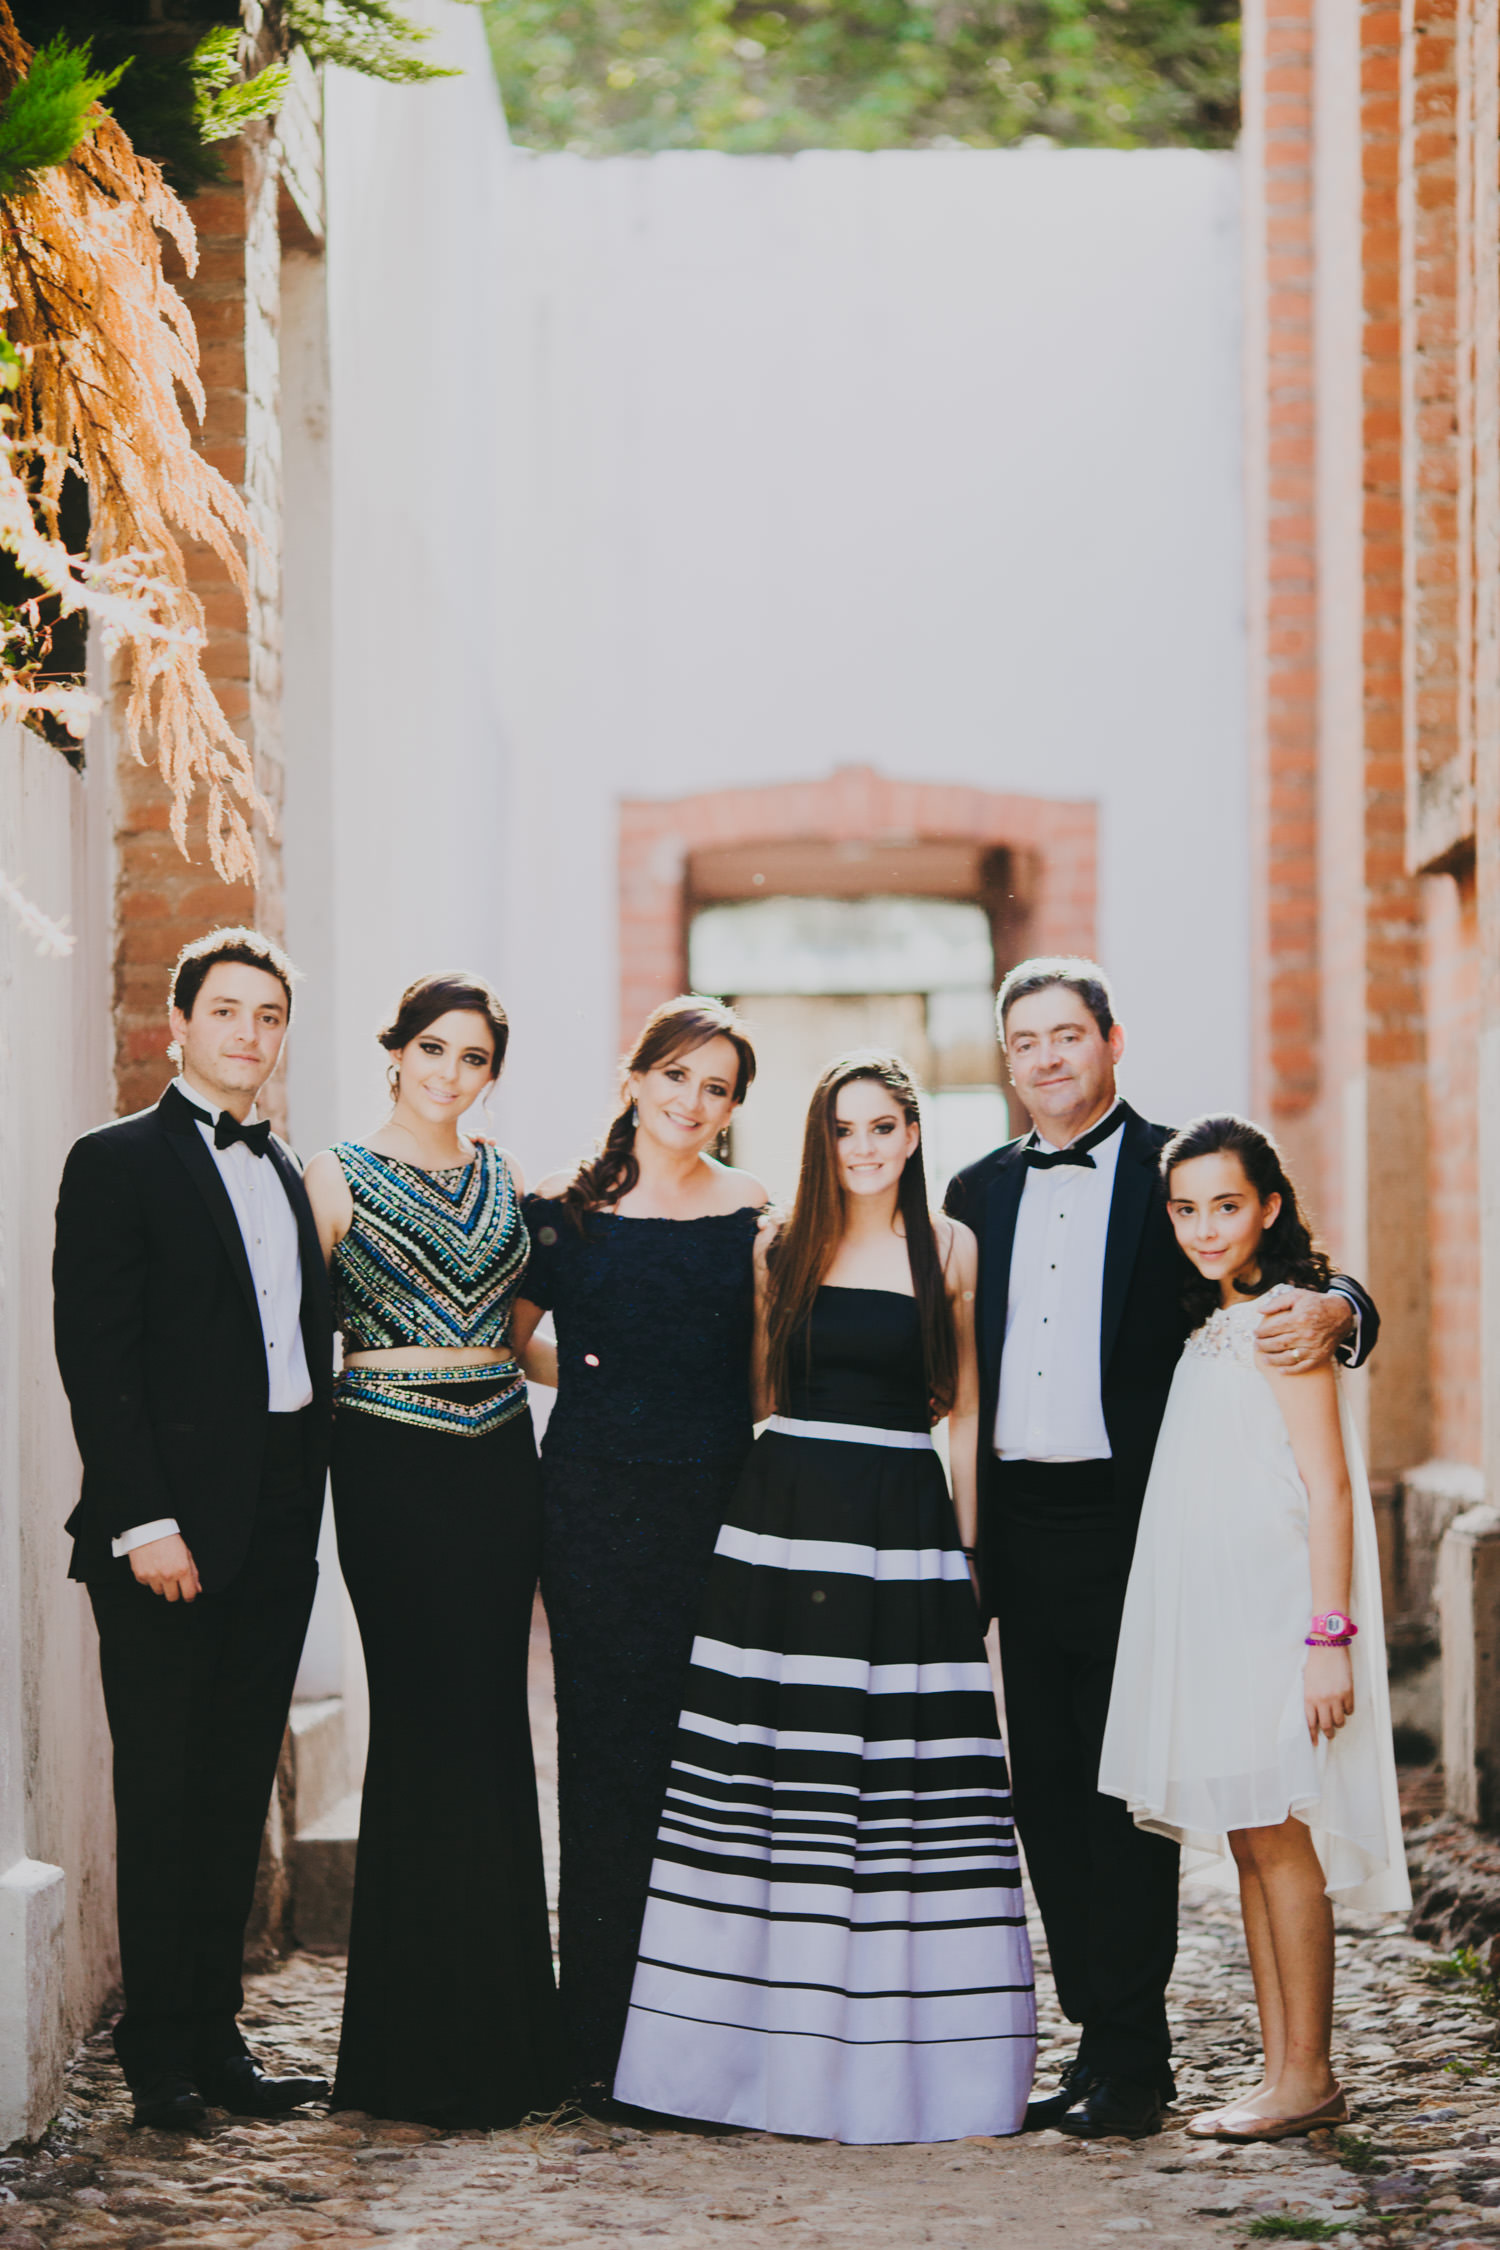 irapuato-boda-fotografia-jardines-alcalde-guanajuato-paulina-juan-pedro--21.jpg